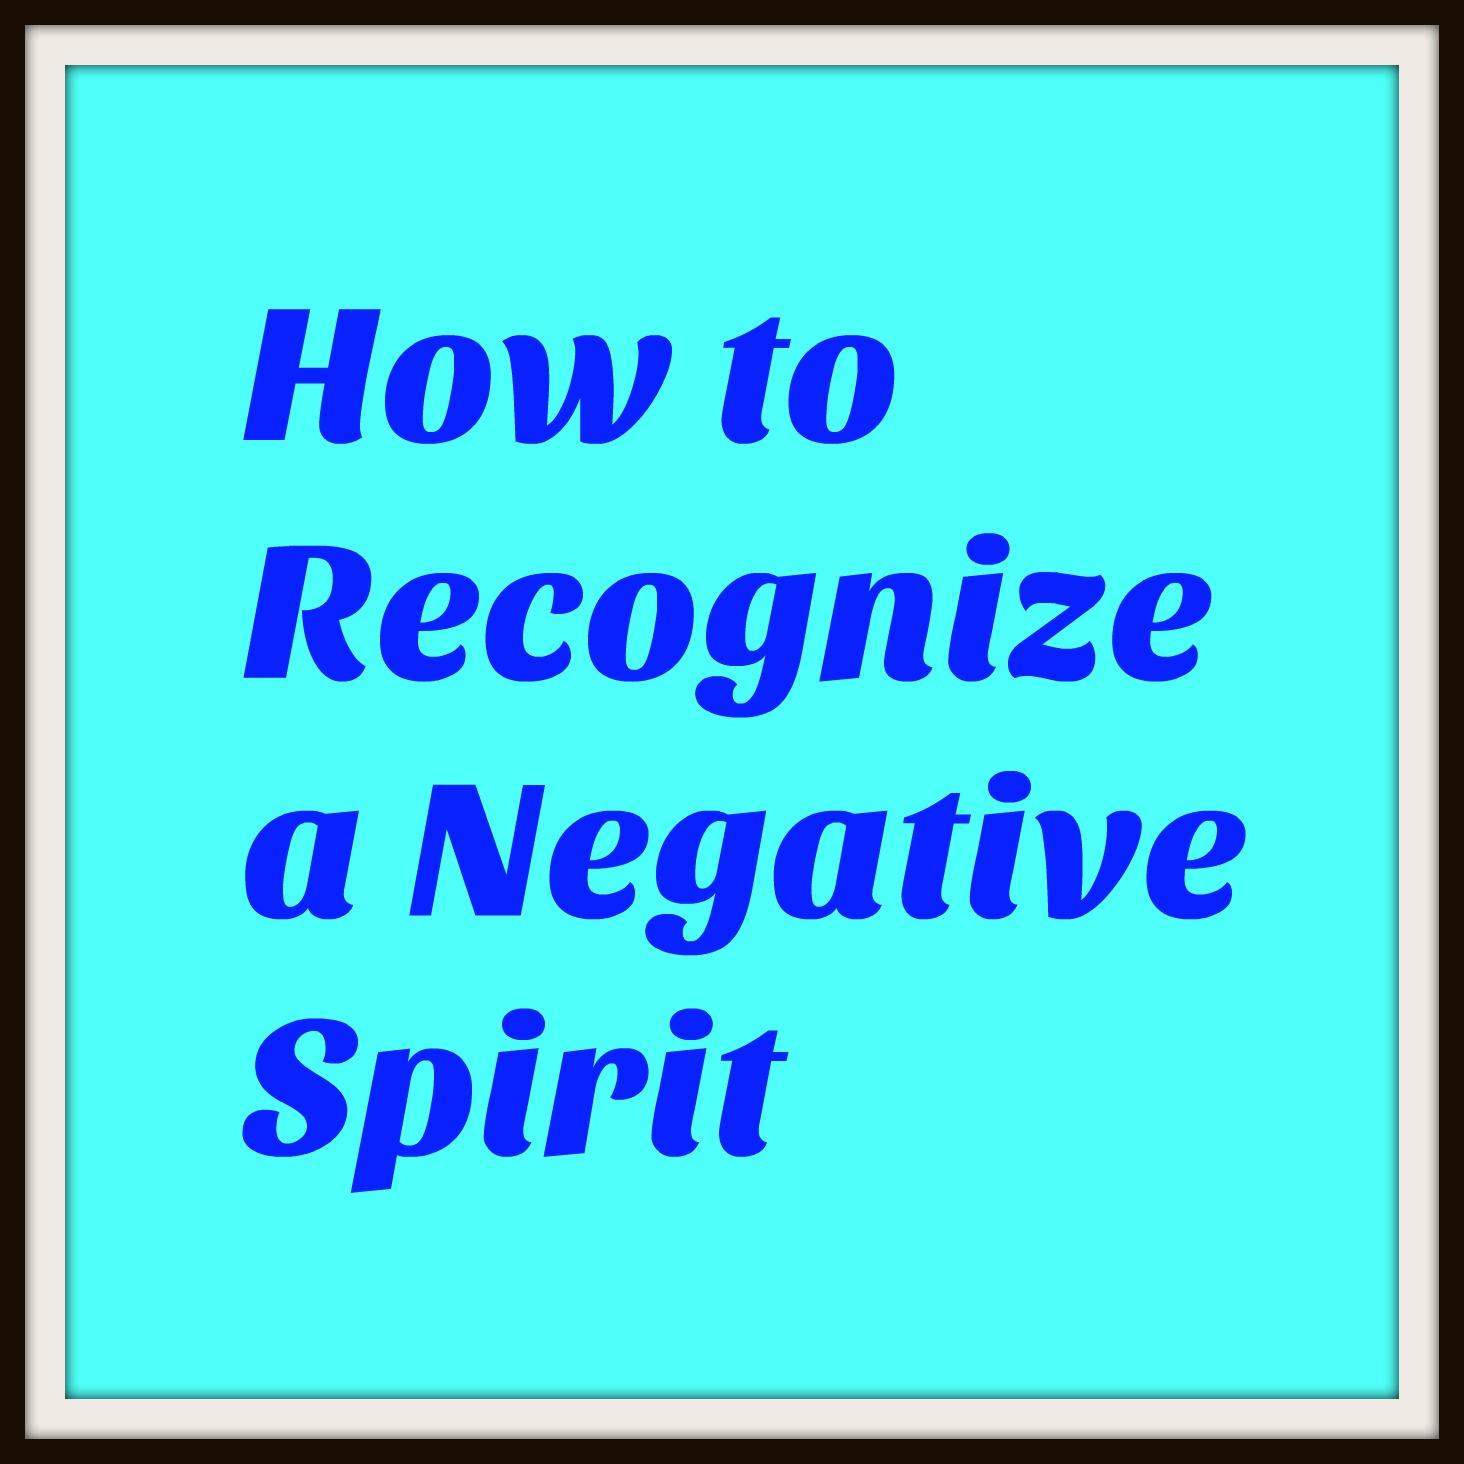 negative spirit